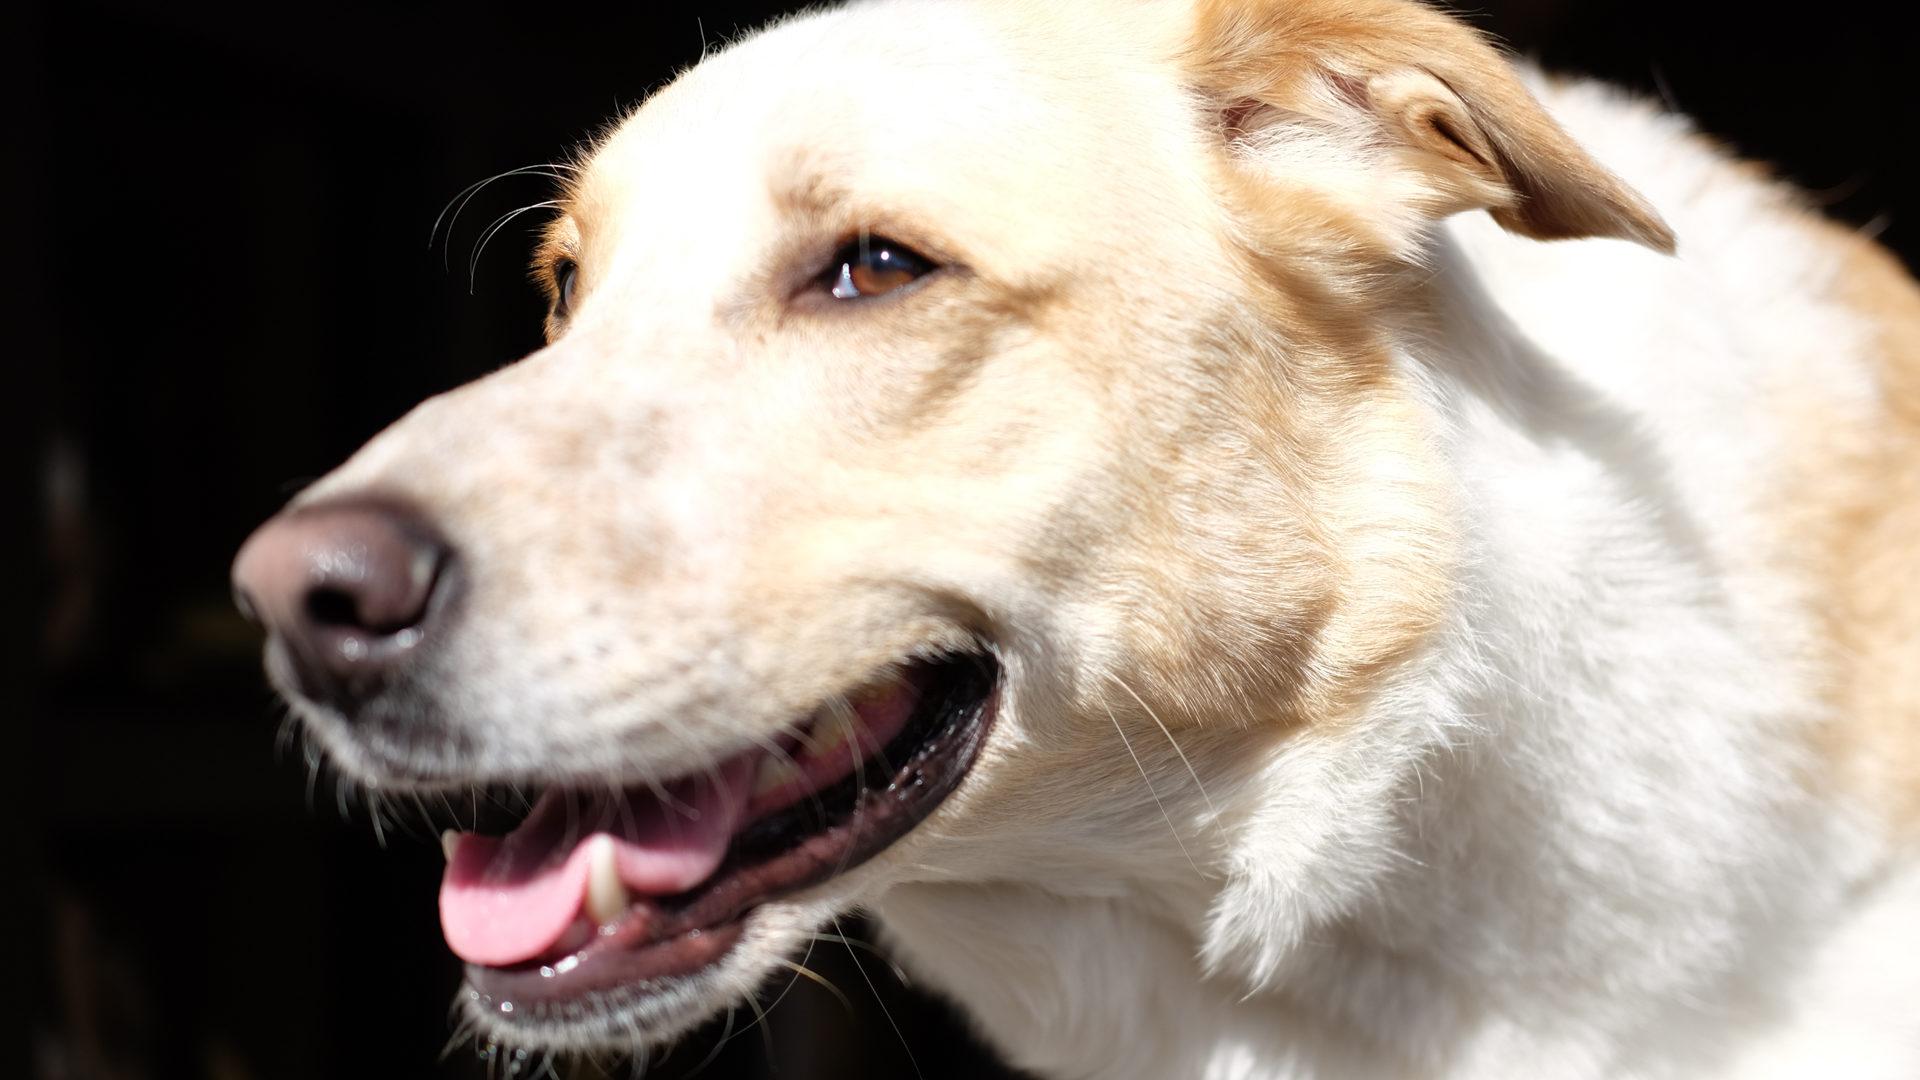 Vetdogs, vetdogs-dogs, Hauttumore, Tumor, Behandlung, Diagnostiki